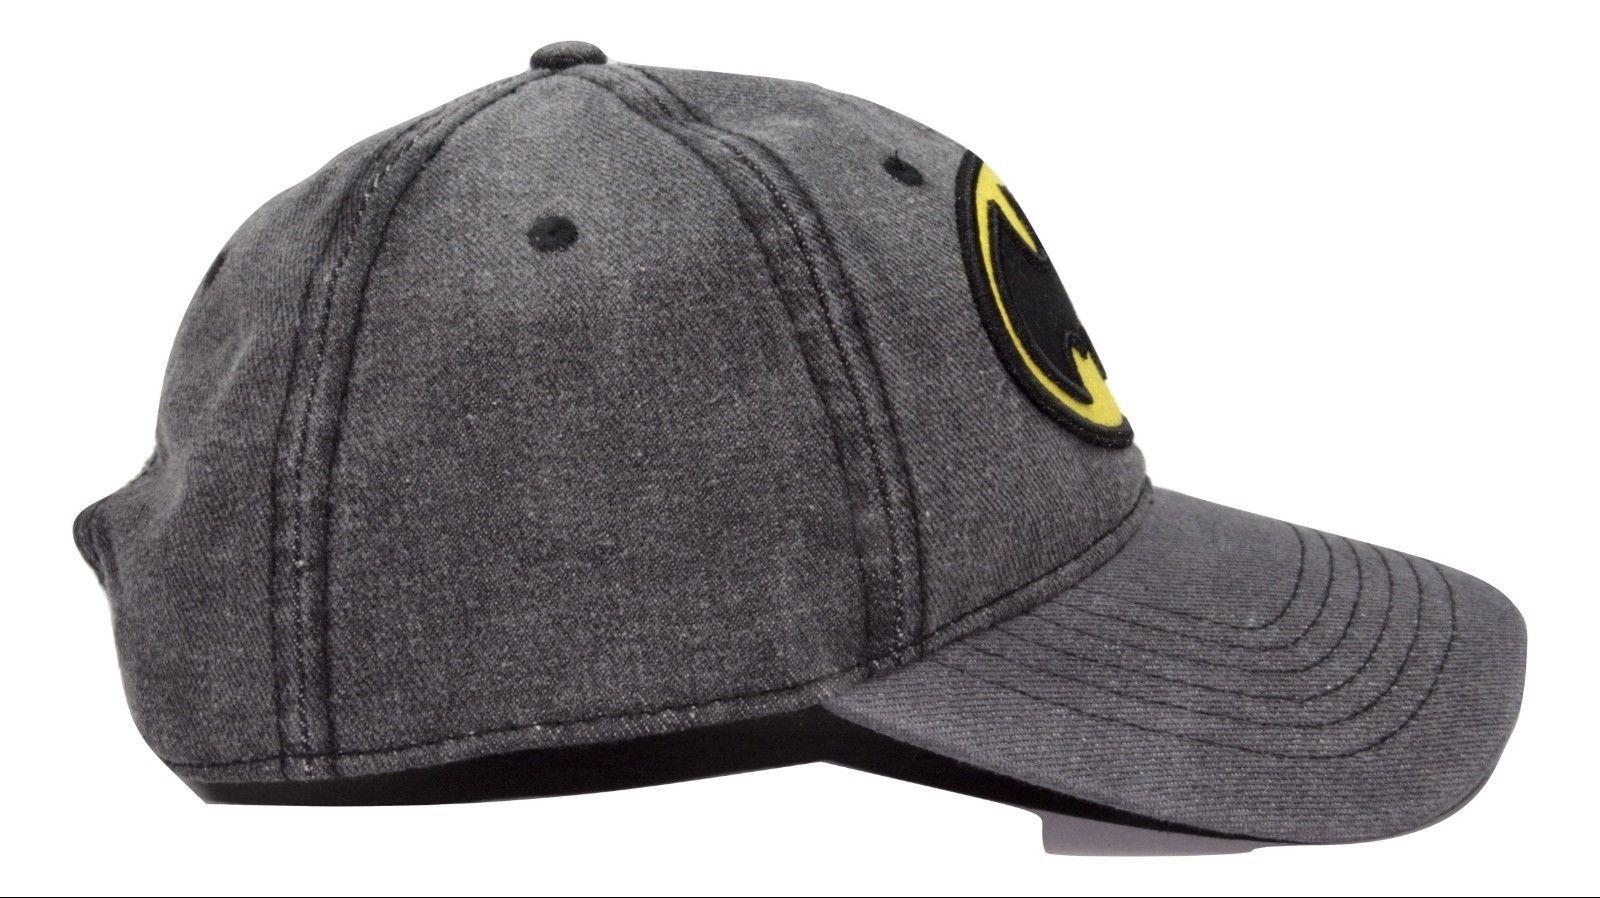 Batman Marvel Comics Patched Logo Adjustable Snap back Denim Dad Hat Style Cap